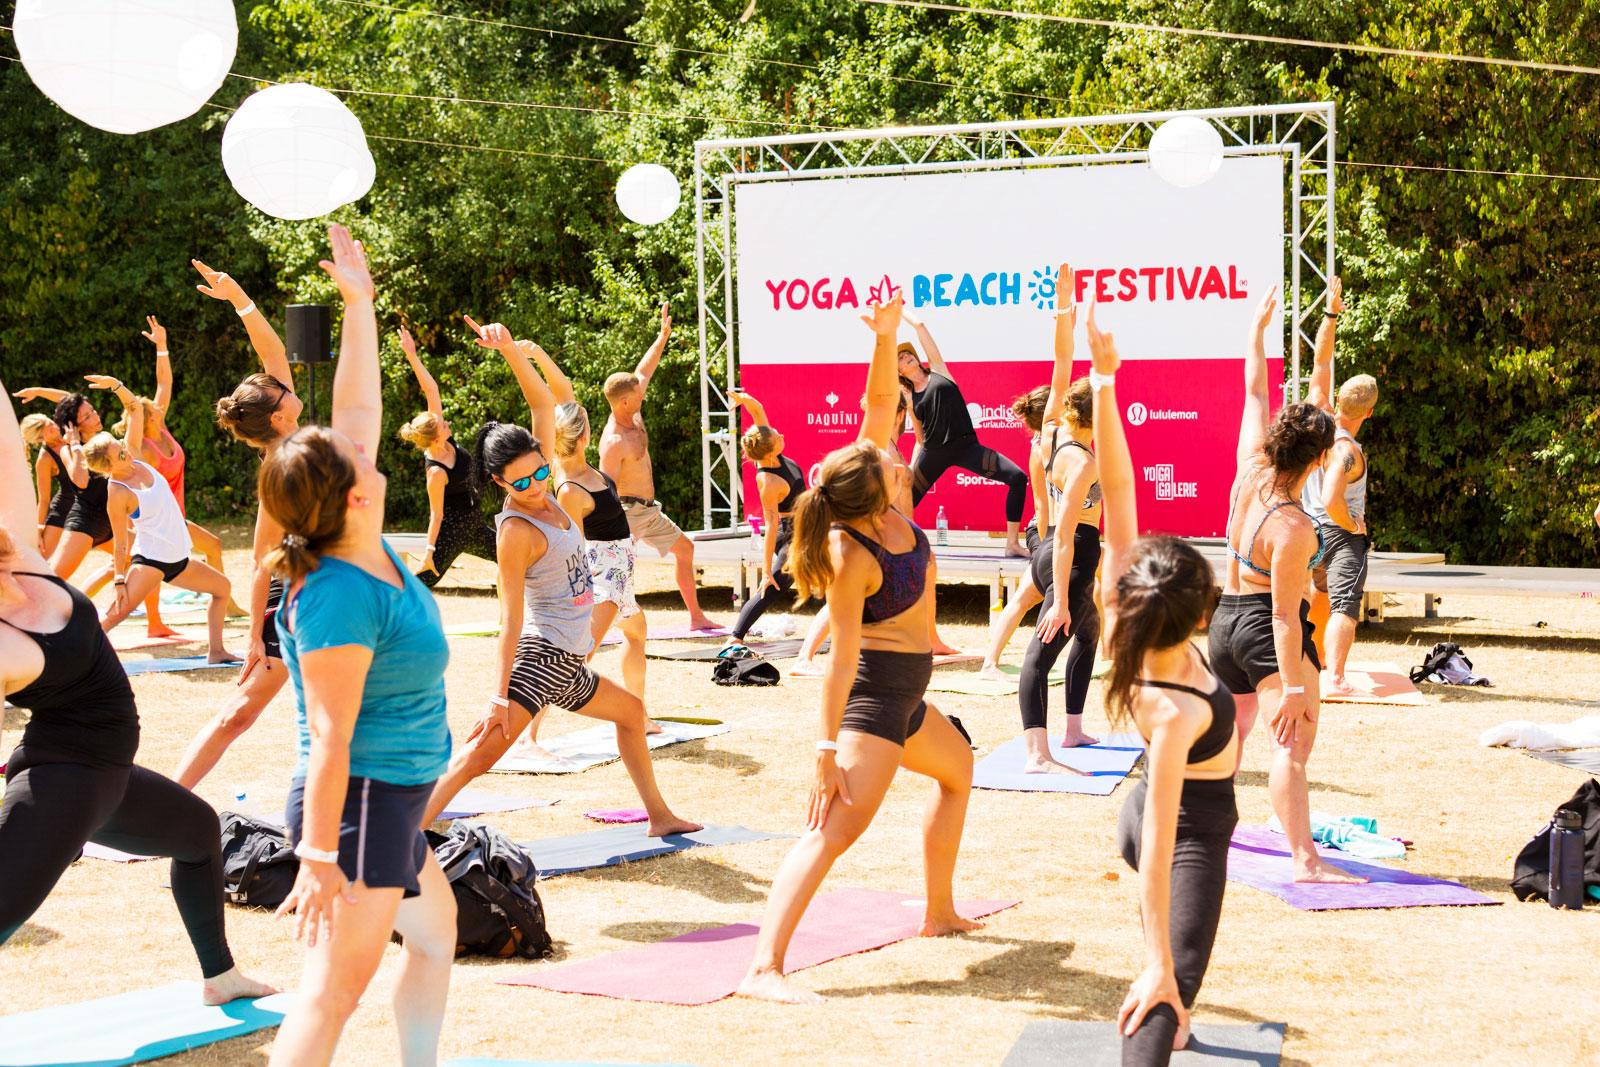 YOGA-BEACH-FESTIVAL_CGN_Banner_People_WEB.jpg